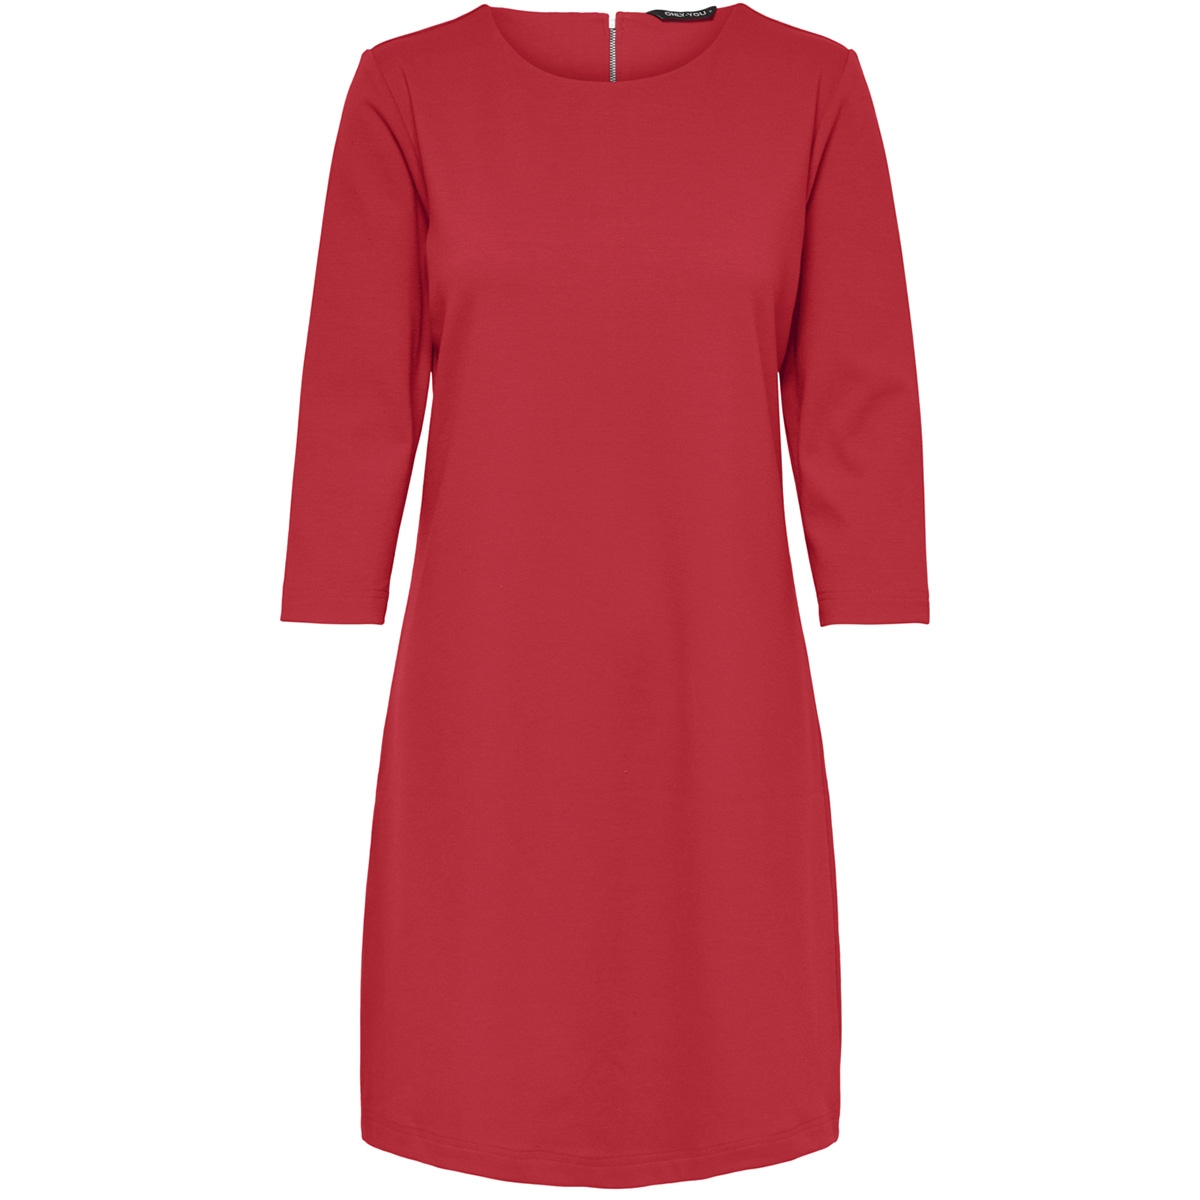 onybrendan 3/4 dress jrs 15178090 only jurk flame scarlet